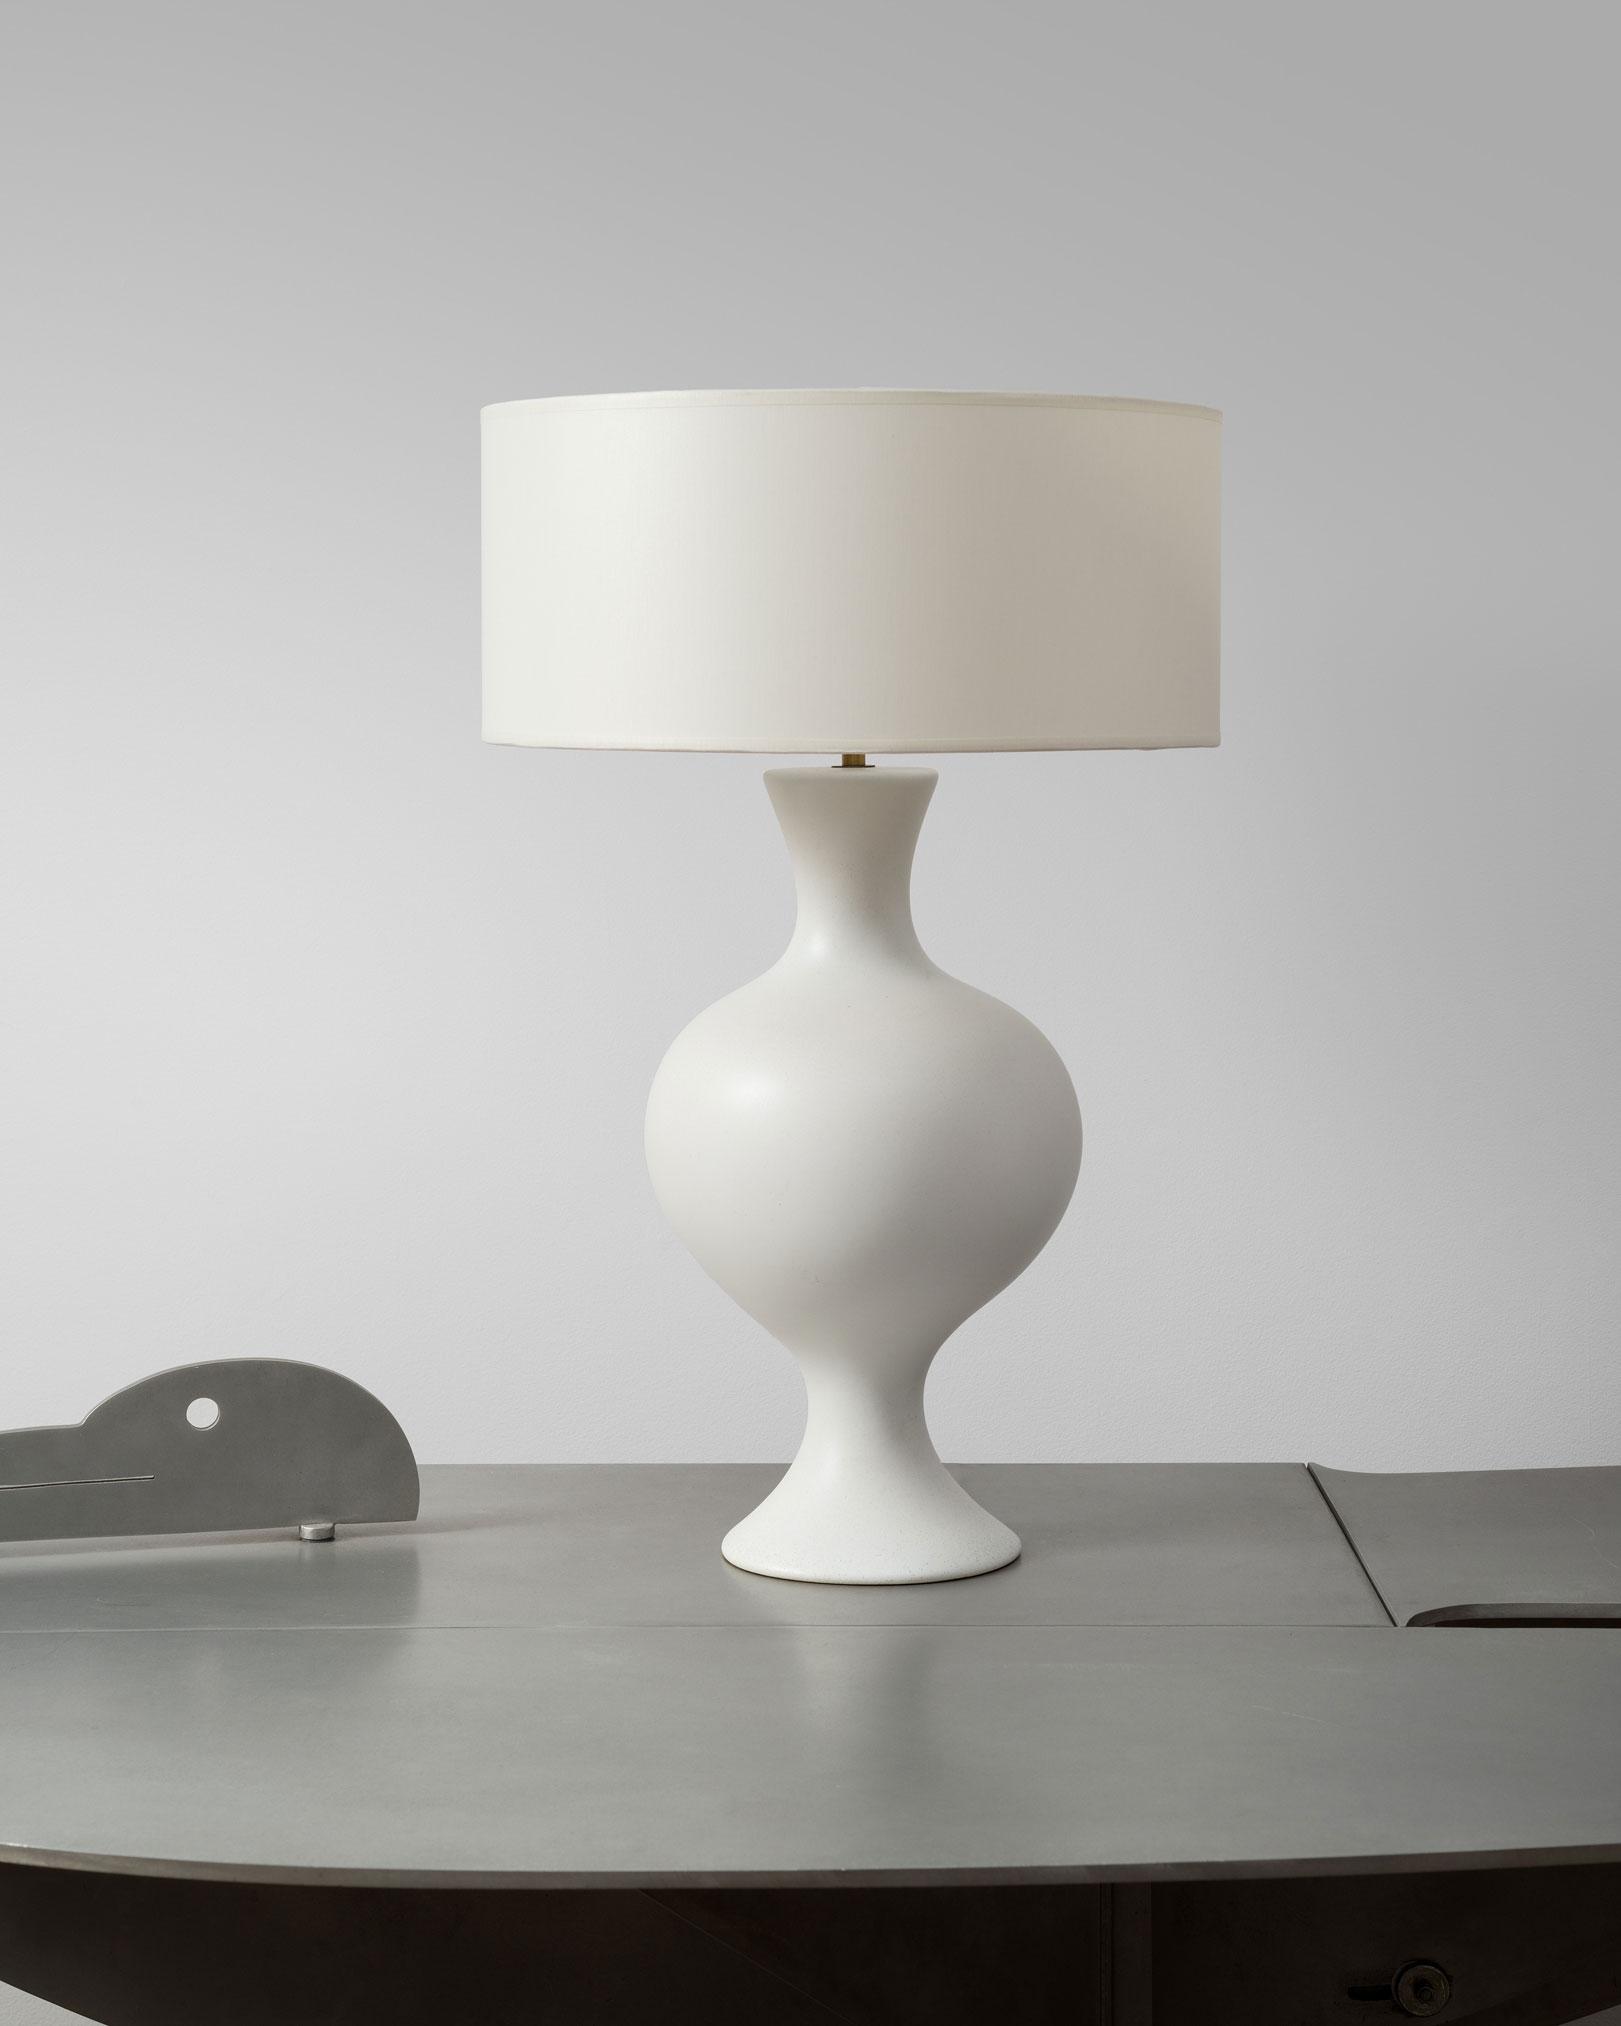 Denyse Gatard, Grande et rare lampe (vendue), vue 01